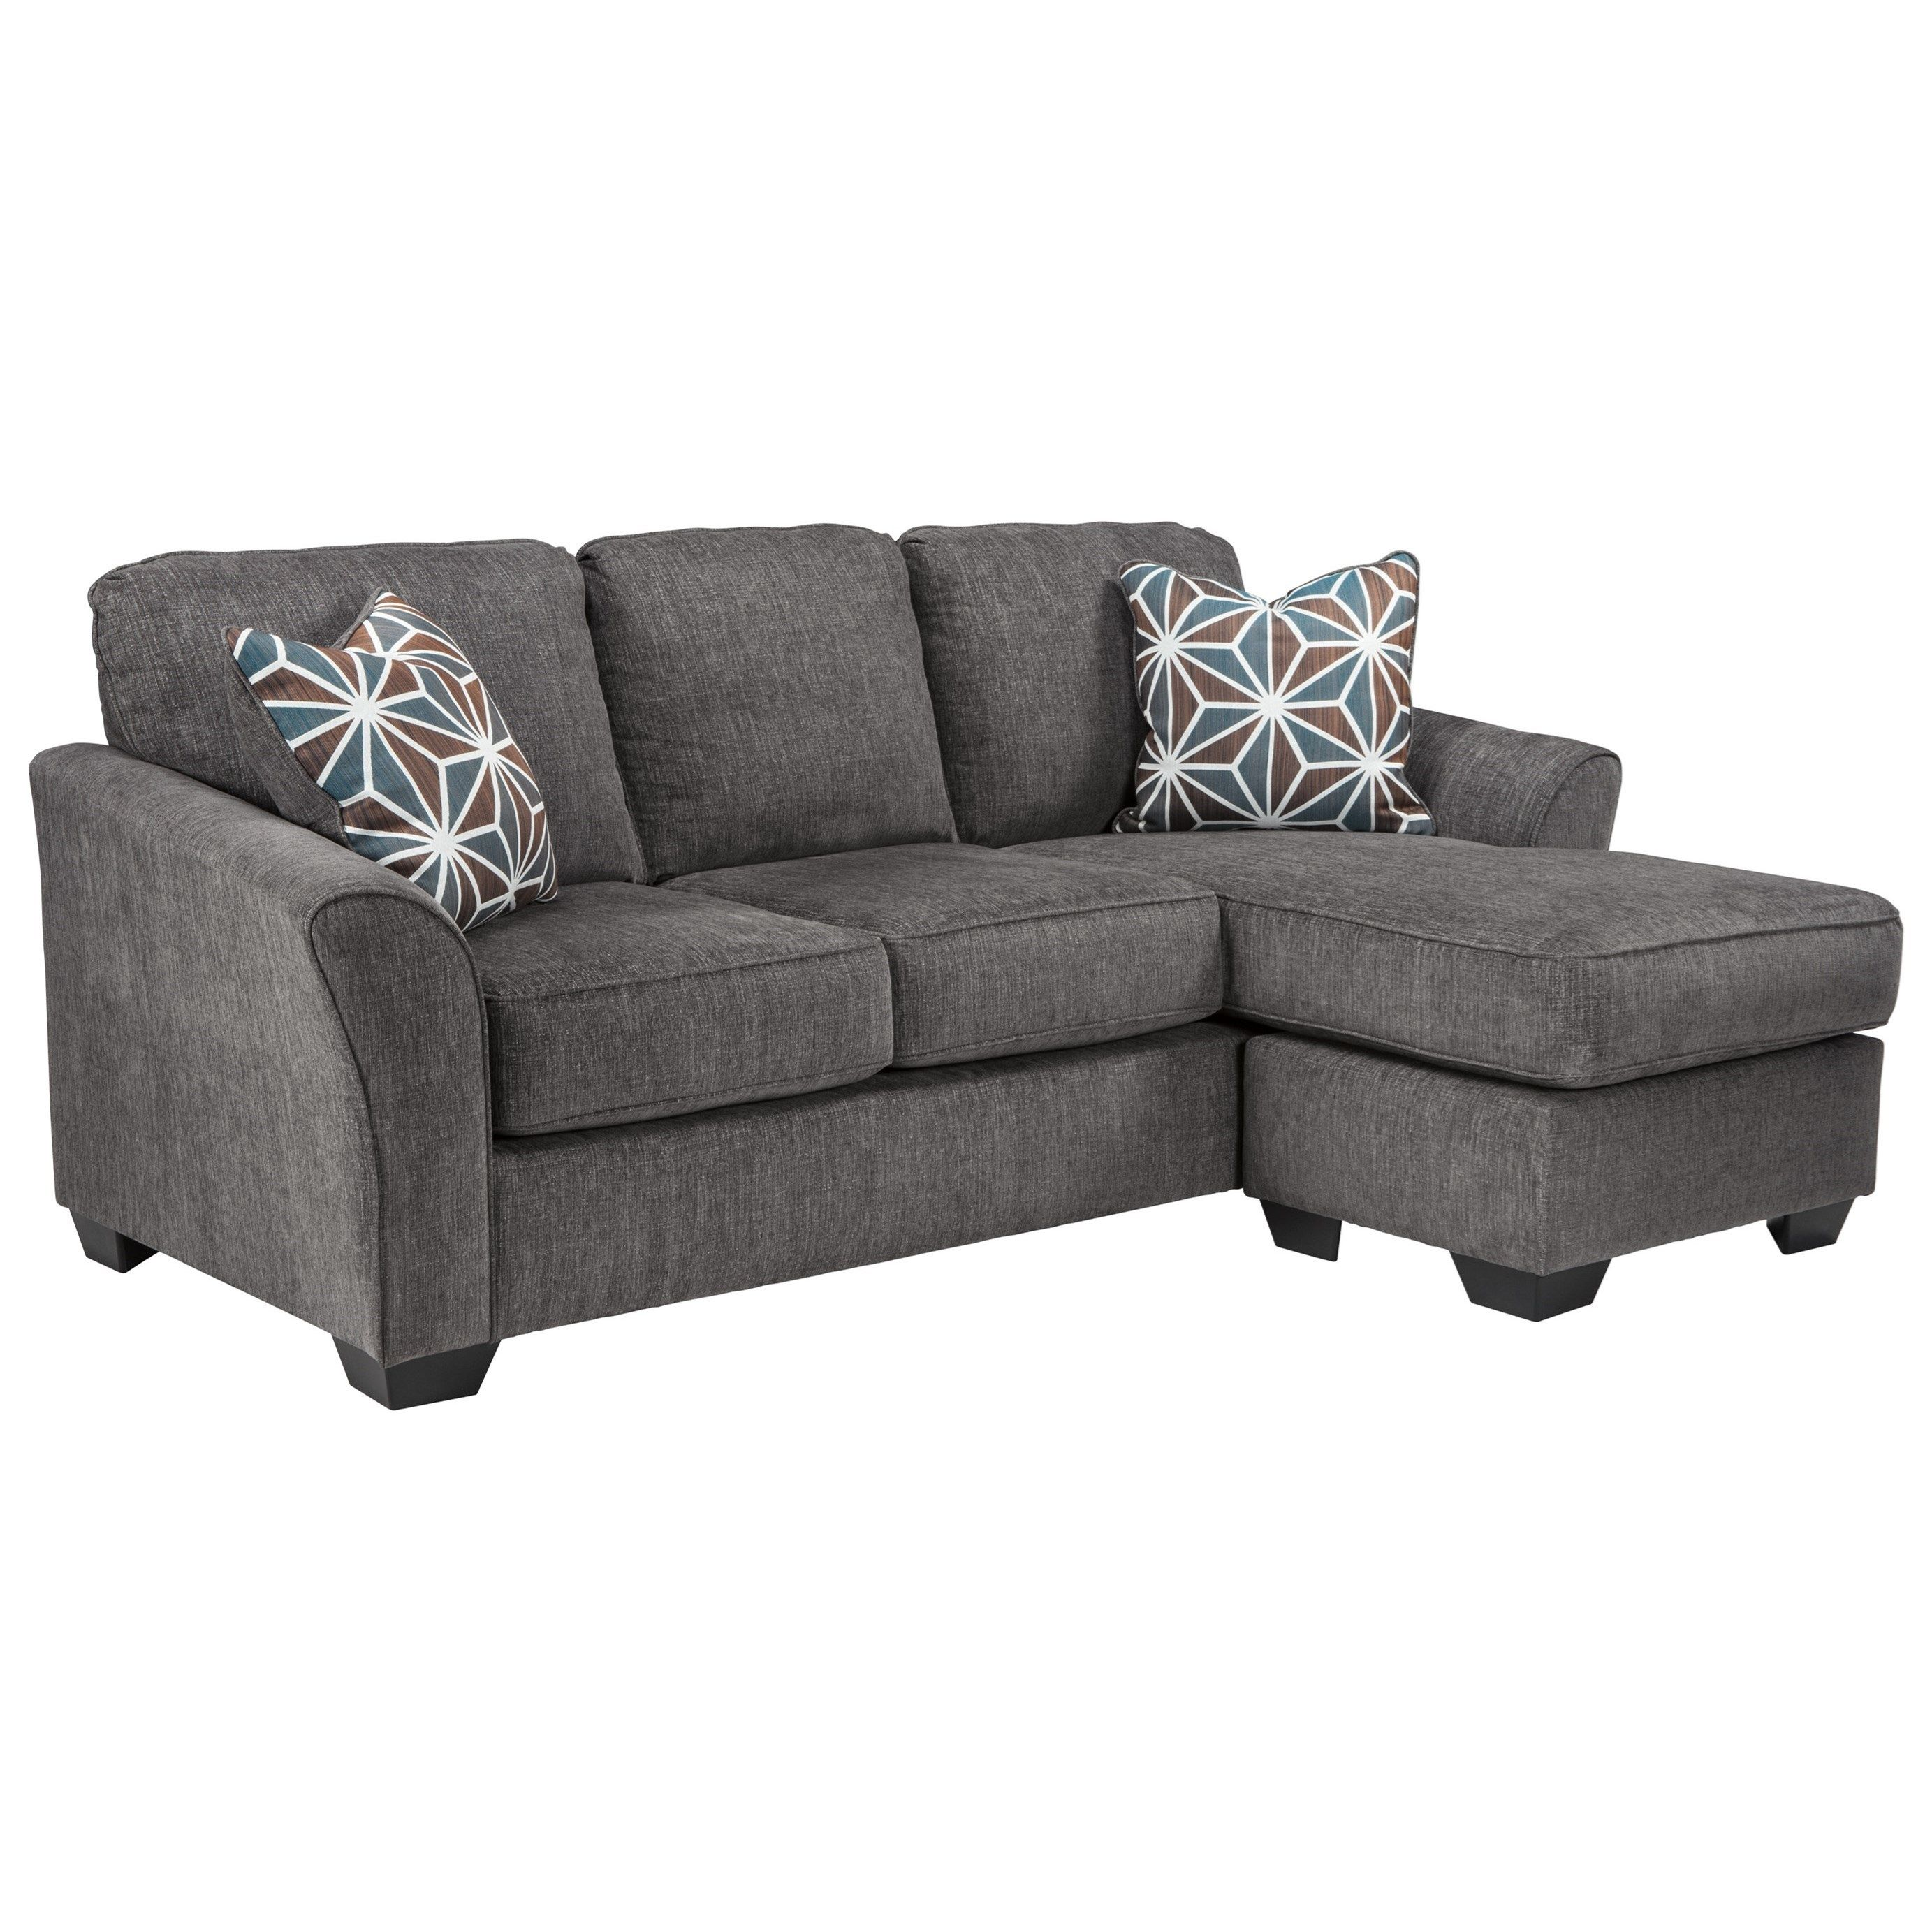 Brise Casual Contemporary Sofa Chaise Belfort Furniture Sectional Sofas Chaise Sofa Slate Sofa Mattress Furniture